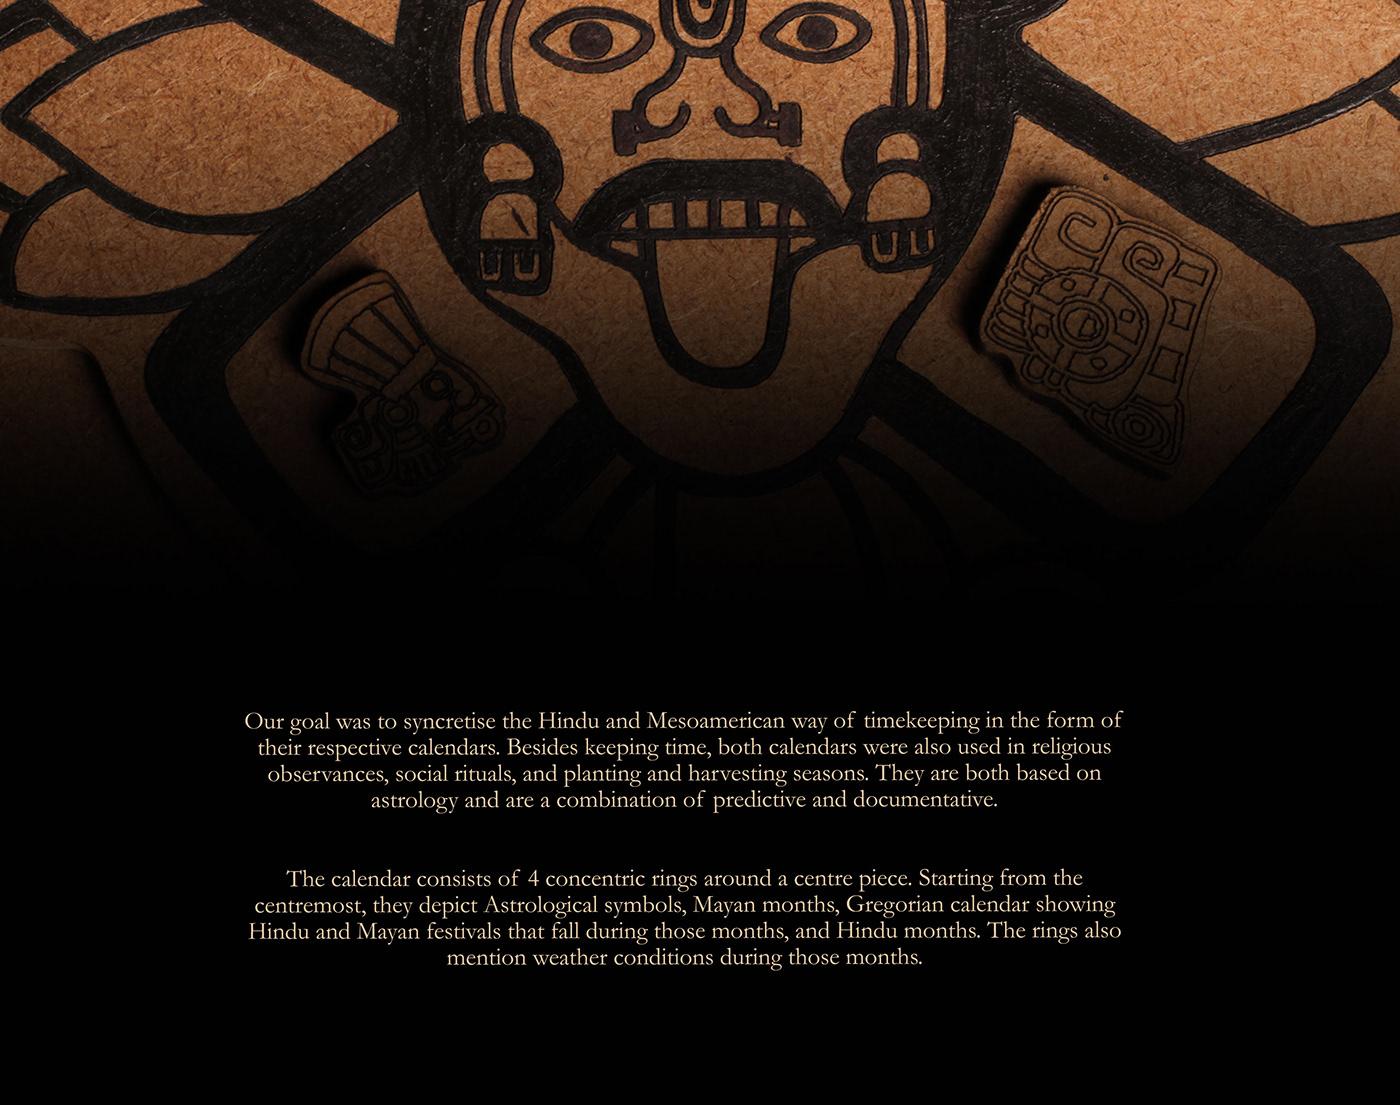 data visualization information design calendar astronomy timekeeping mayan Hindu transcultural